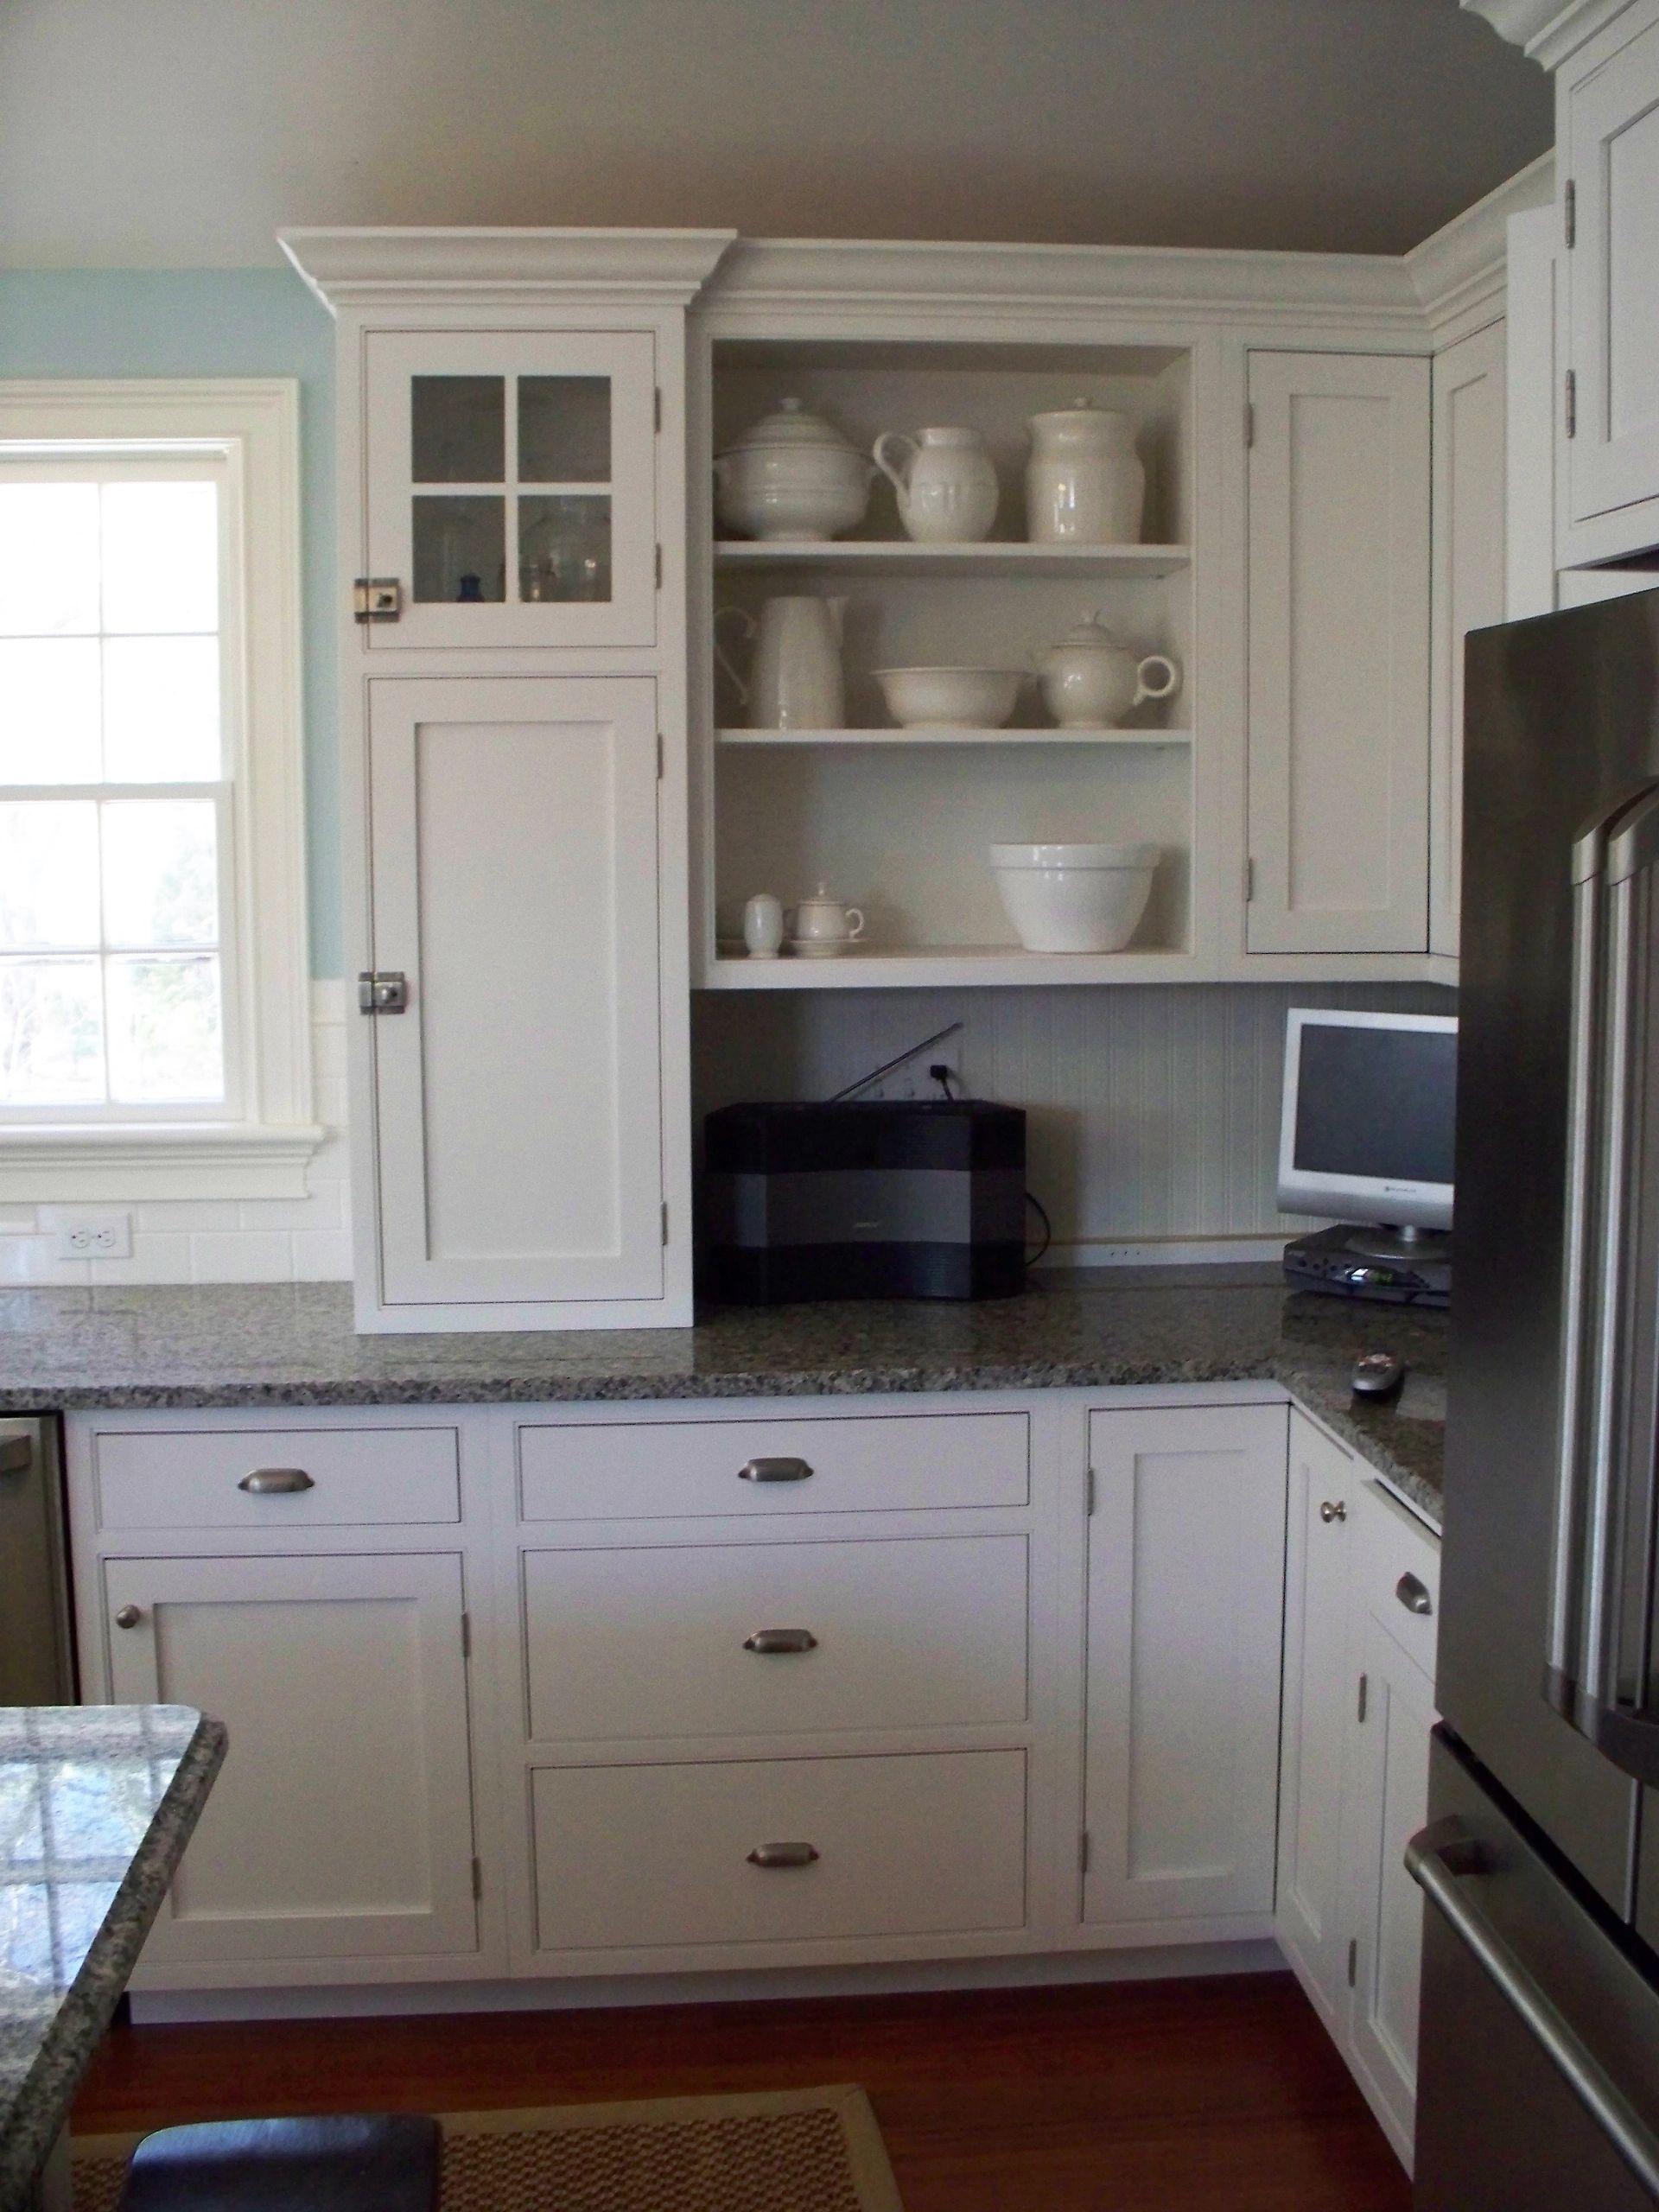 Complete Kitchen & Bath Remodeling Pembroke, MA | Kitchen in ...